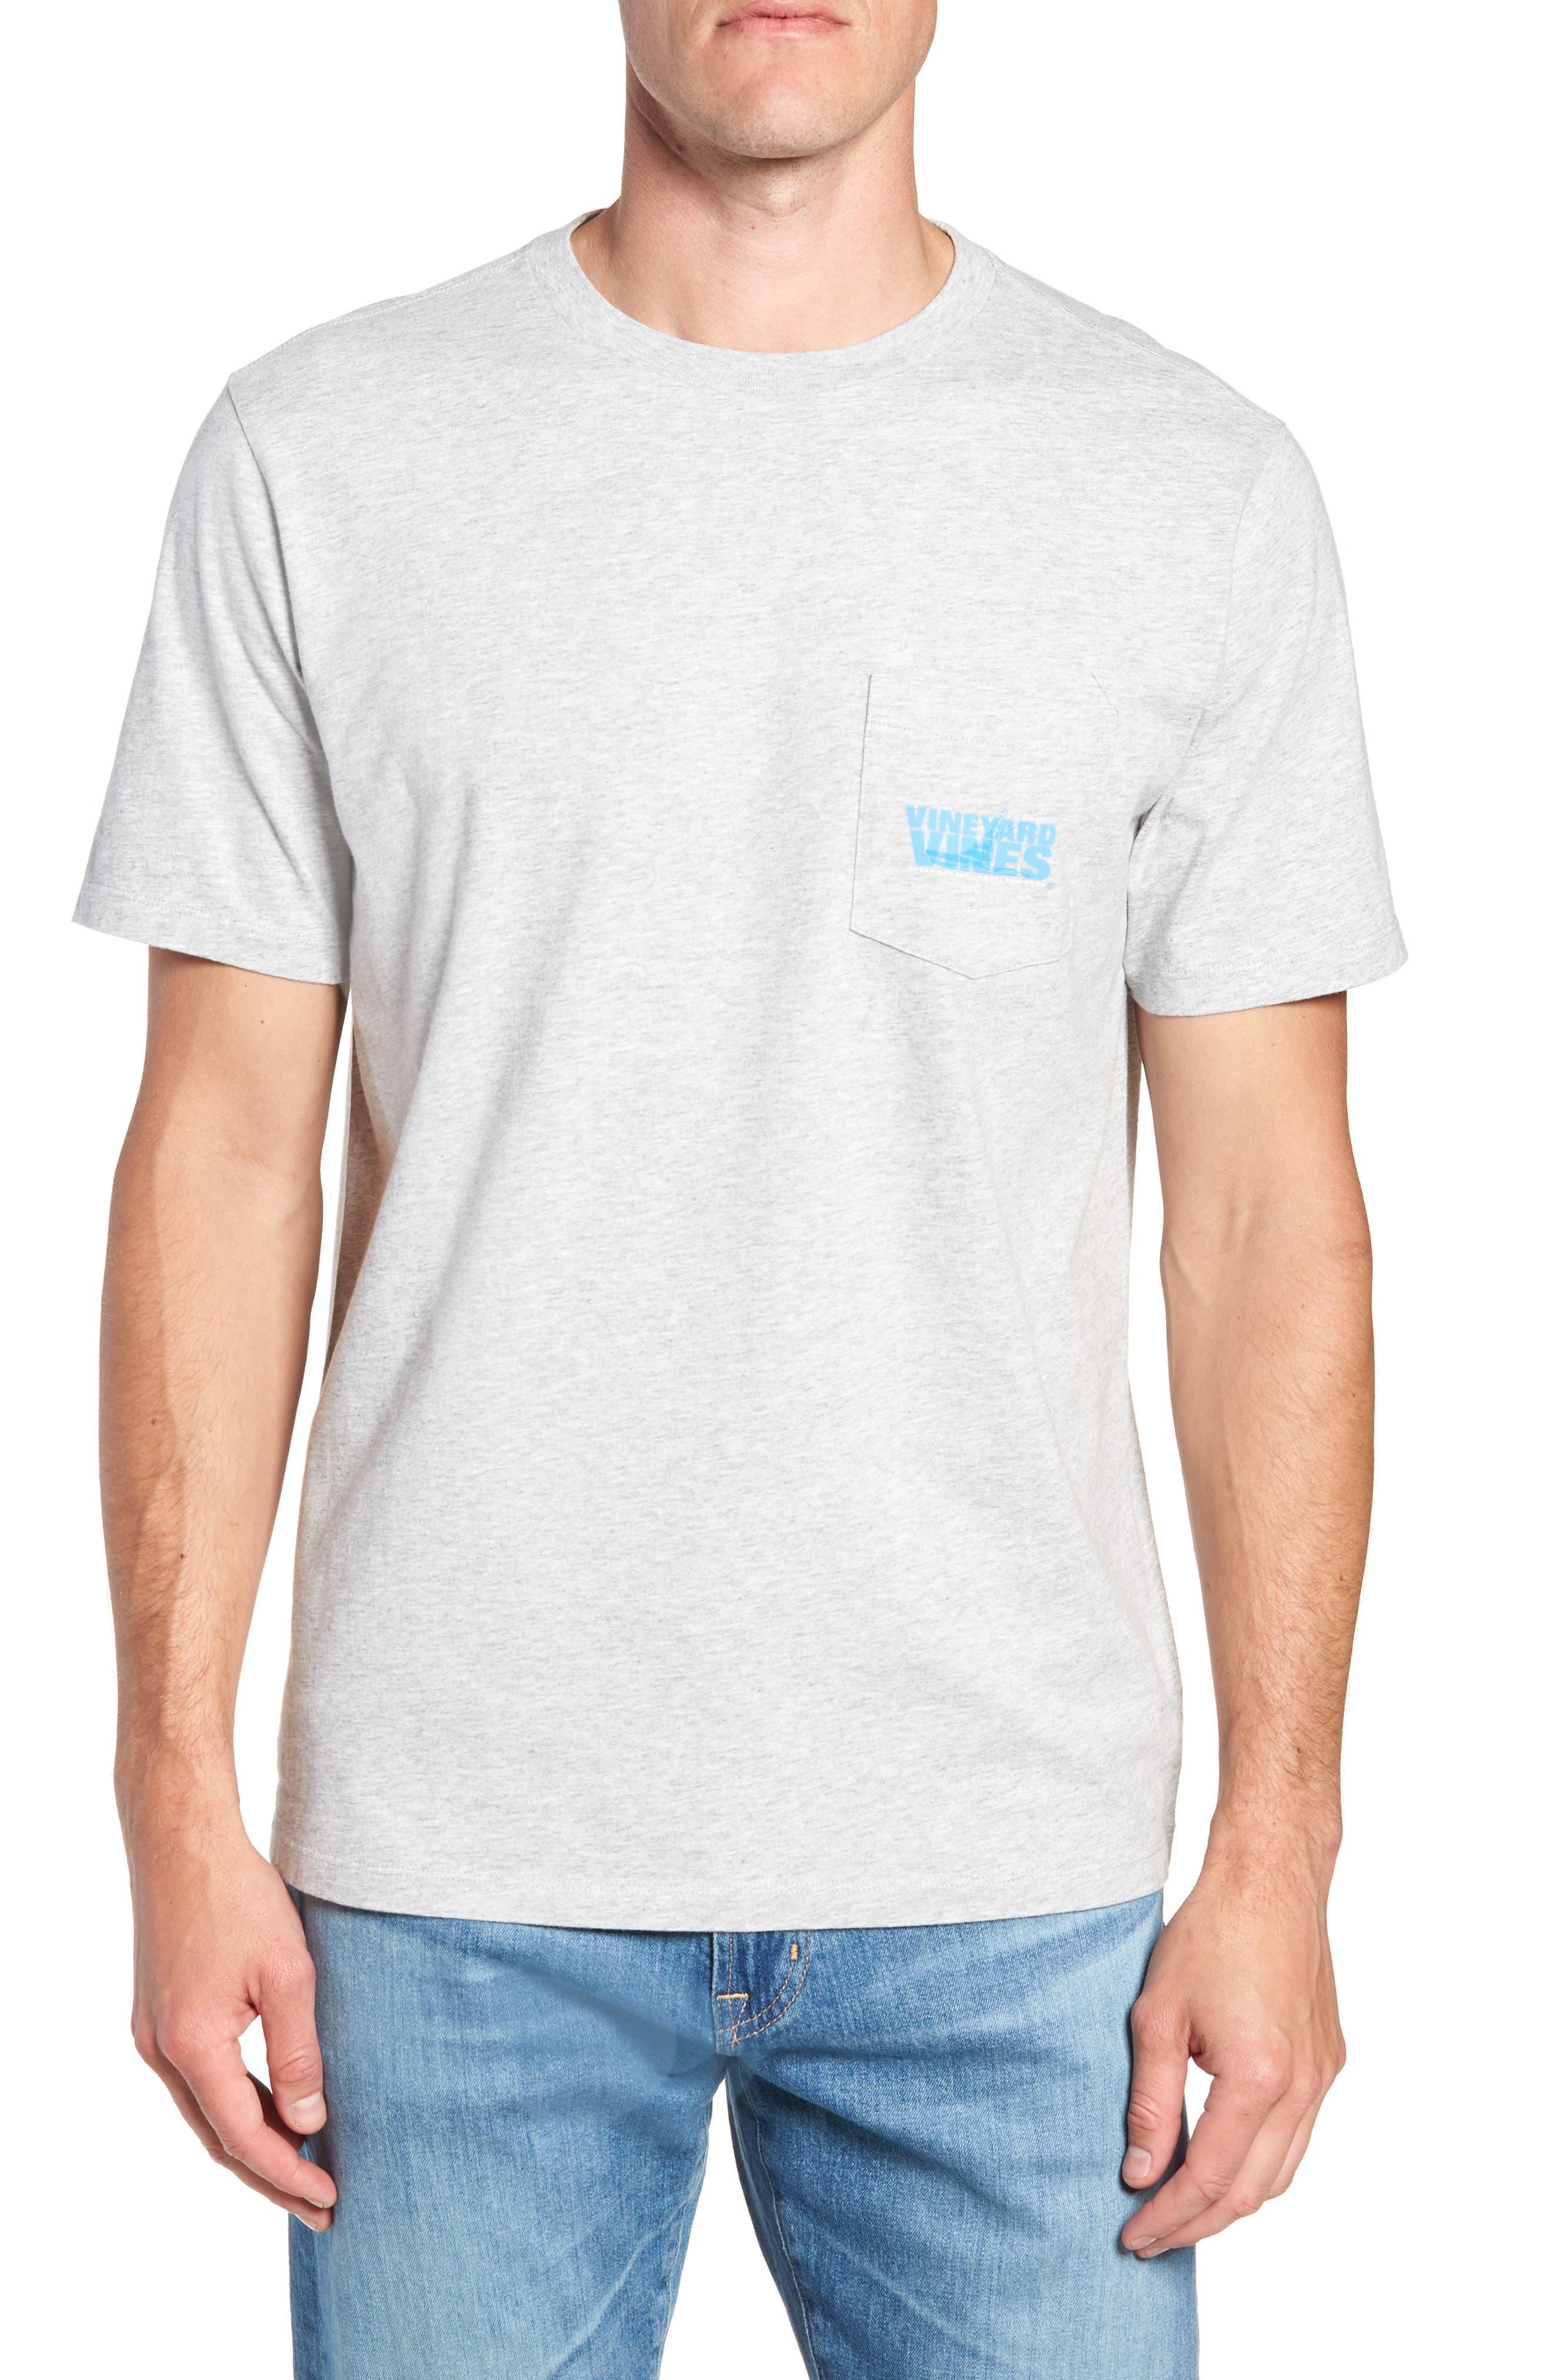 Knockout Sportfisher T-Shirt,                         Main,                         color, GRAY HEATHER